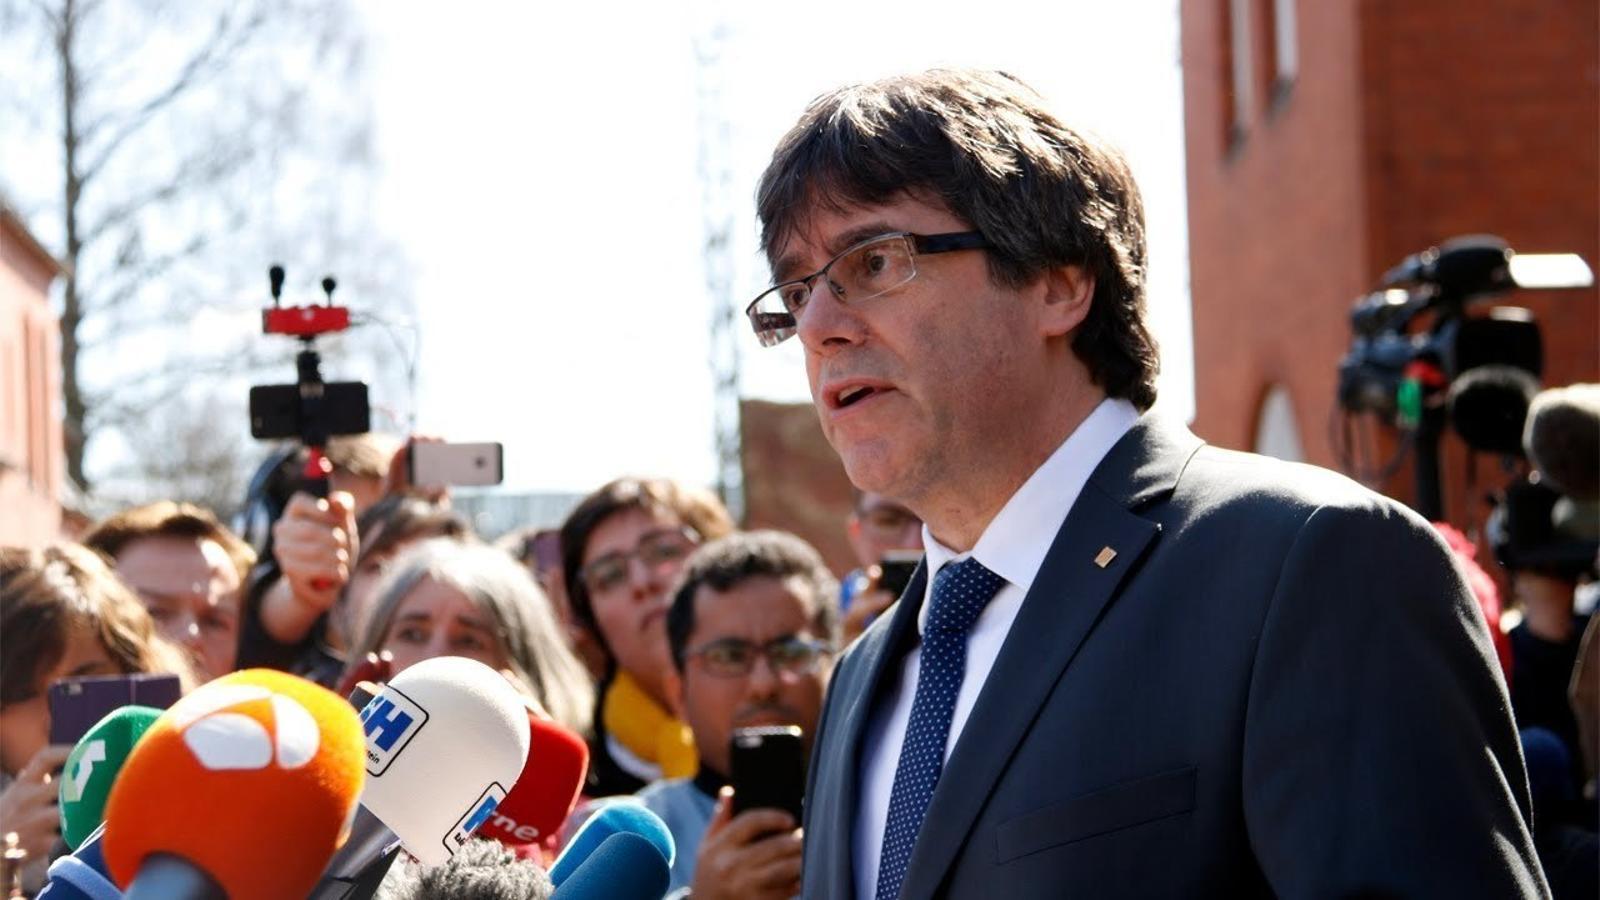 Primeres declaracions de Puigdemont en sortir de la presó de Neumünster